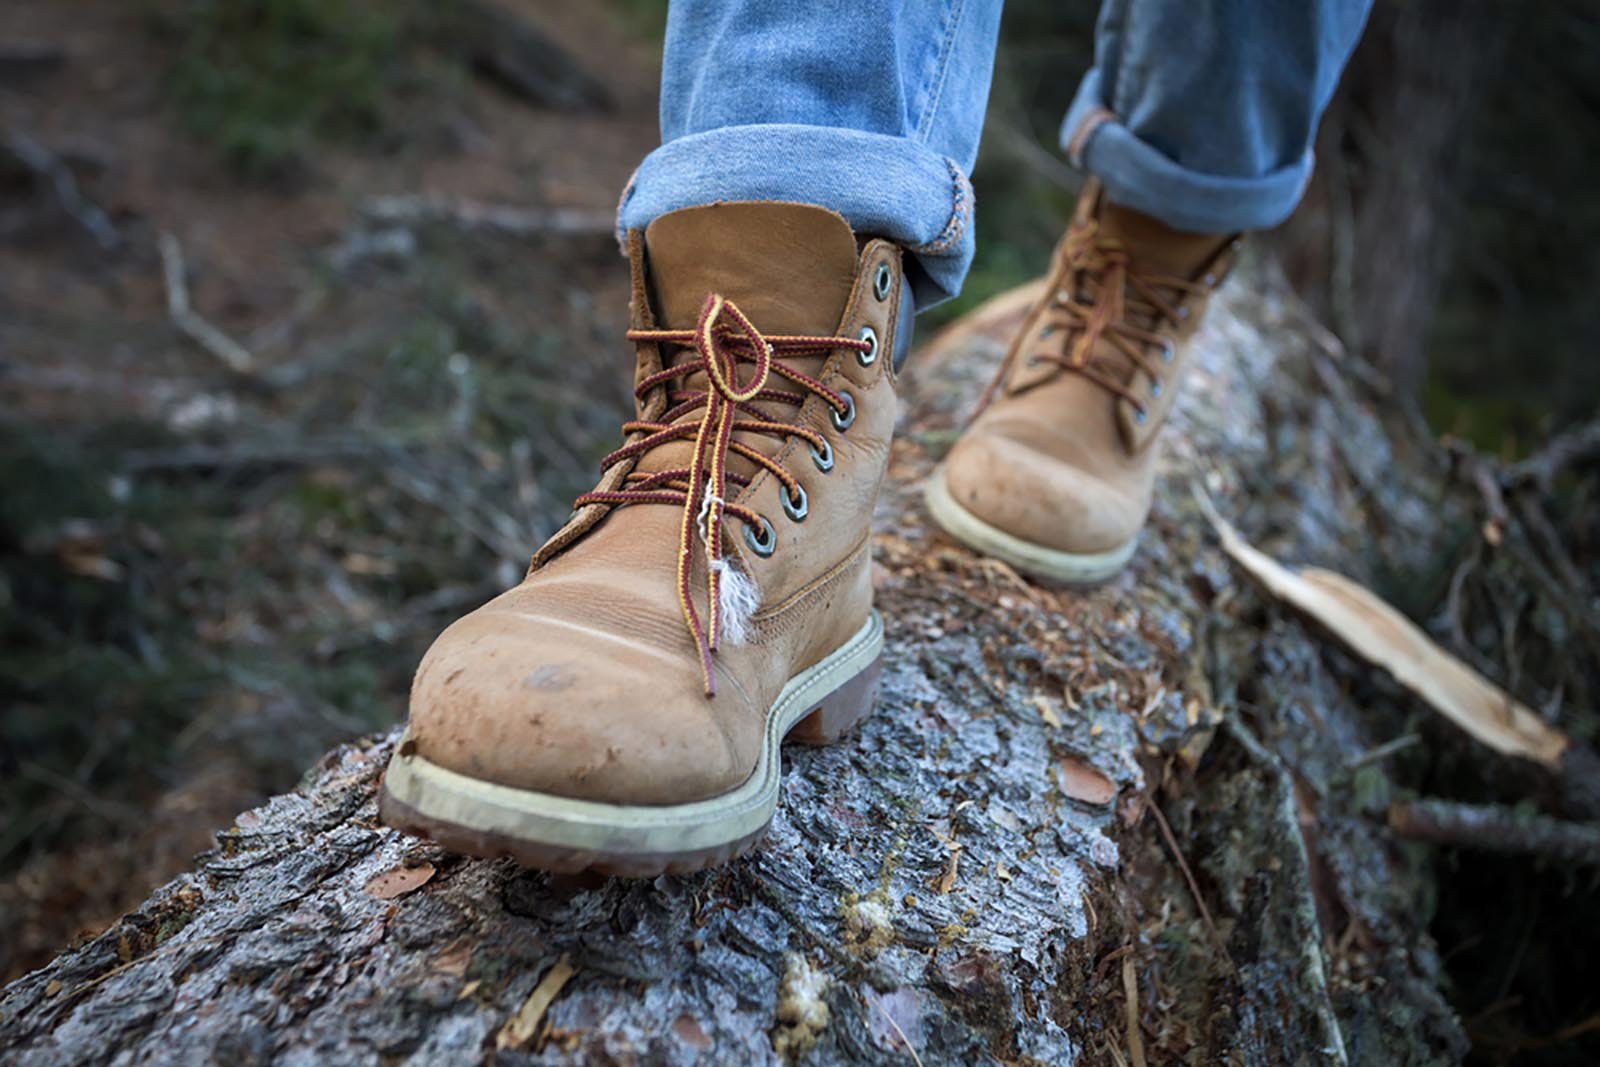 pelican consumer blog comfortable hiking boots